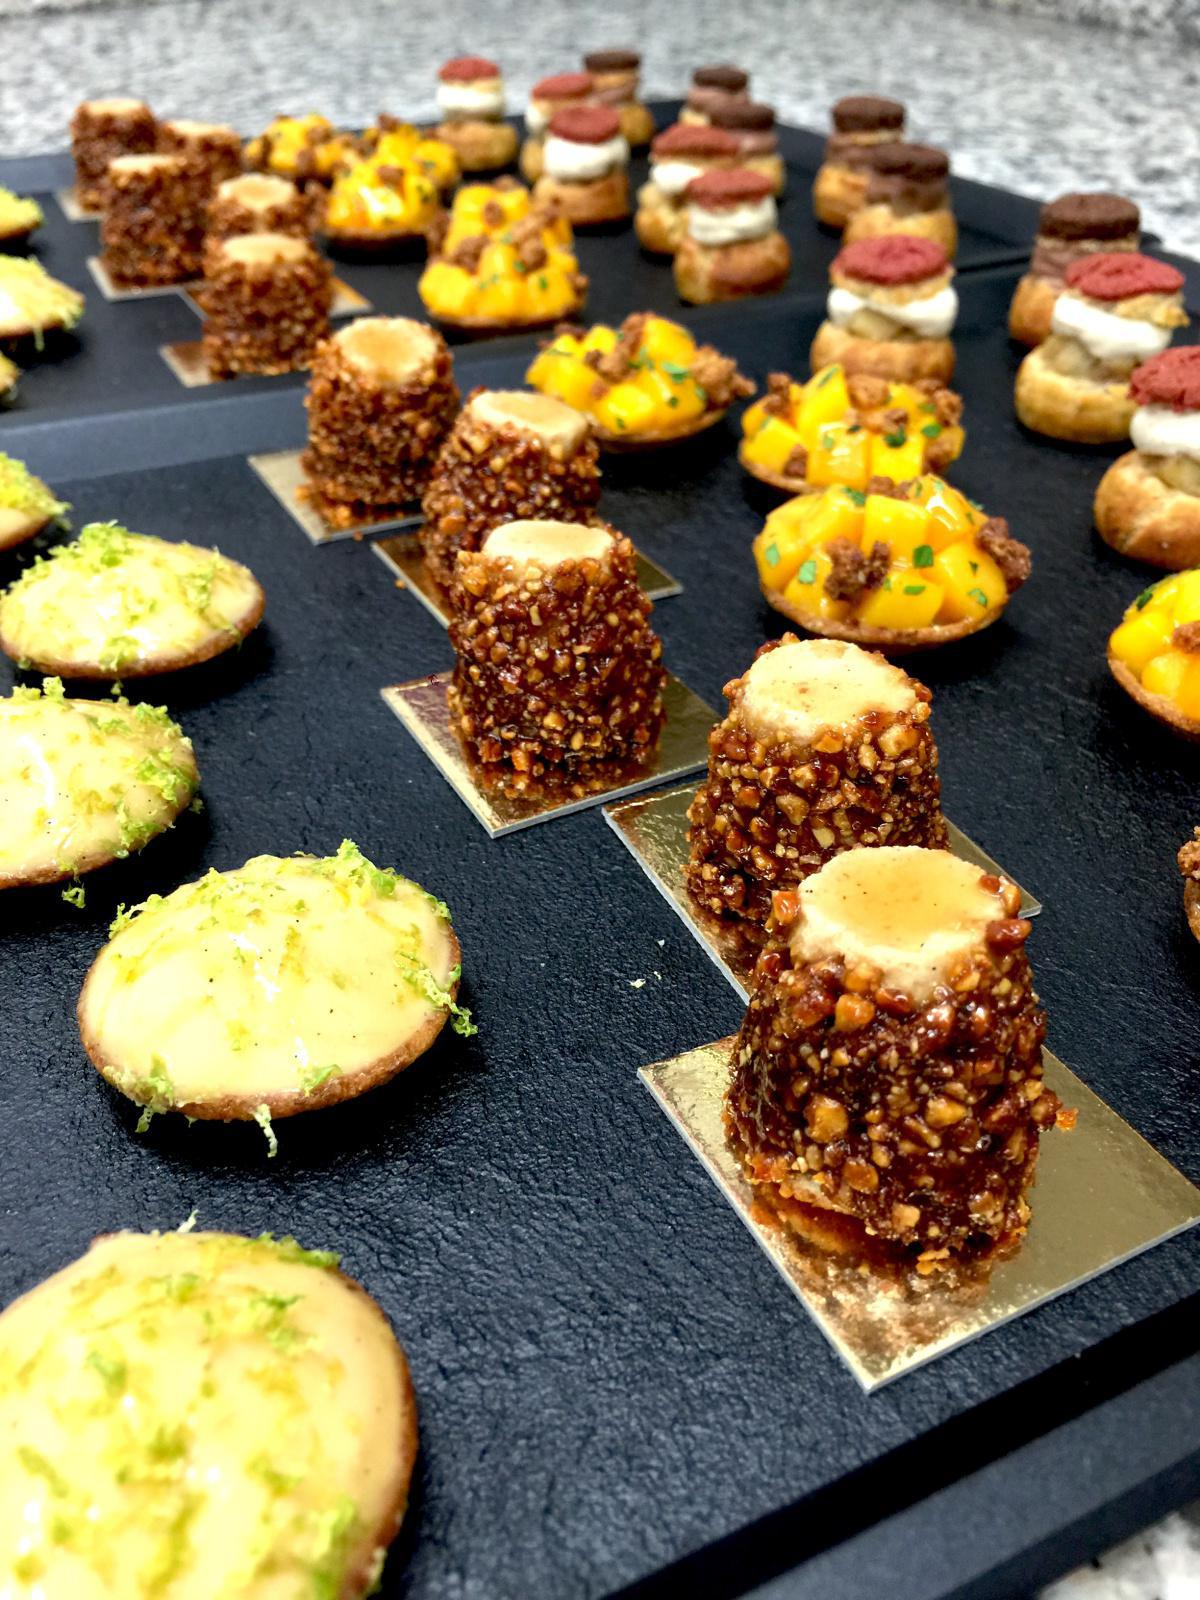 FOUCADE PARIS - Sweet gastronomy - Testé par le Club - Tested by the Club Amilcar